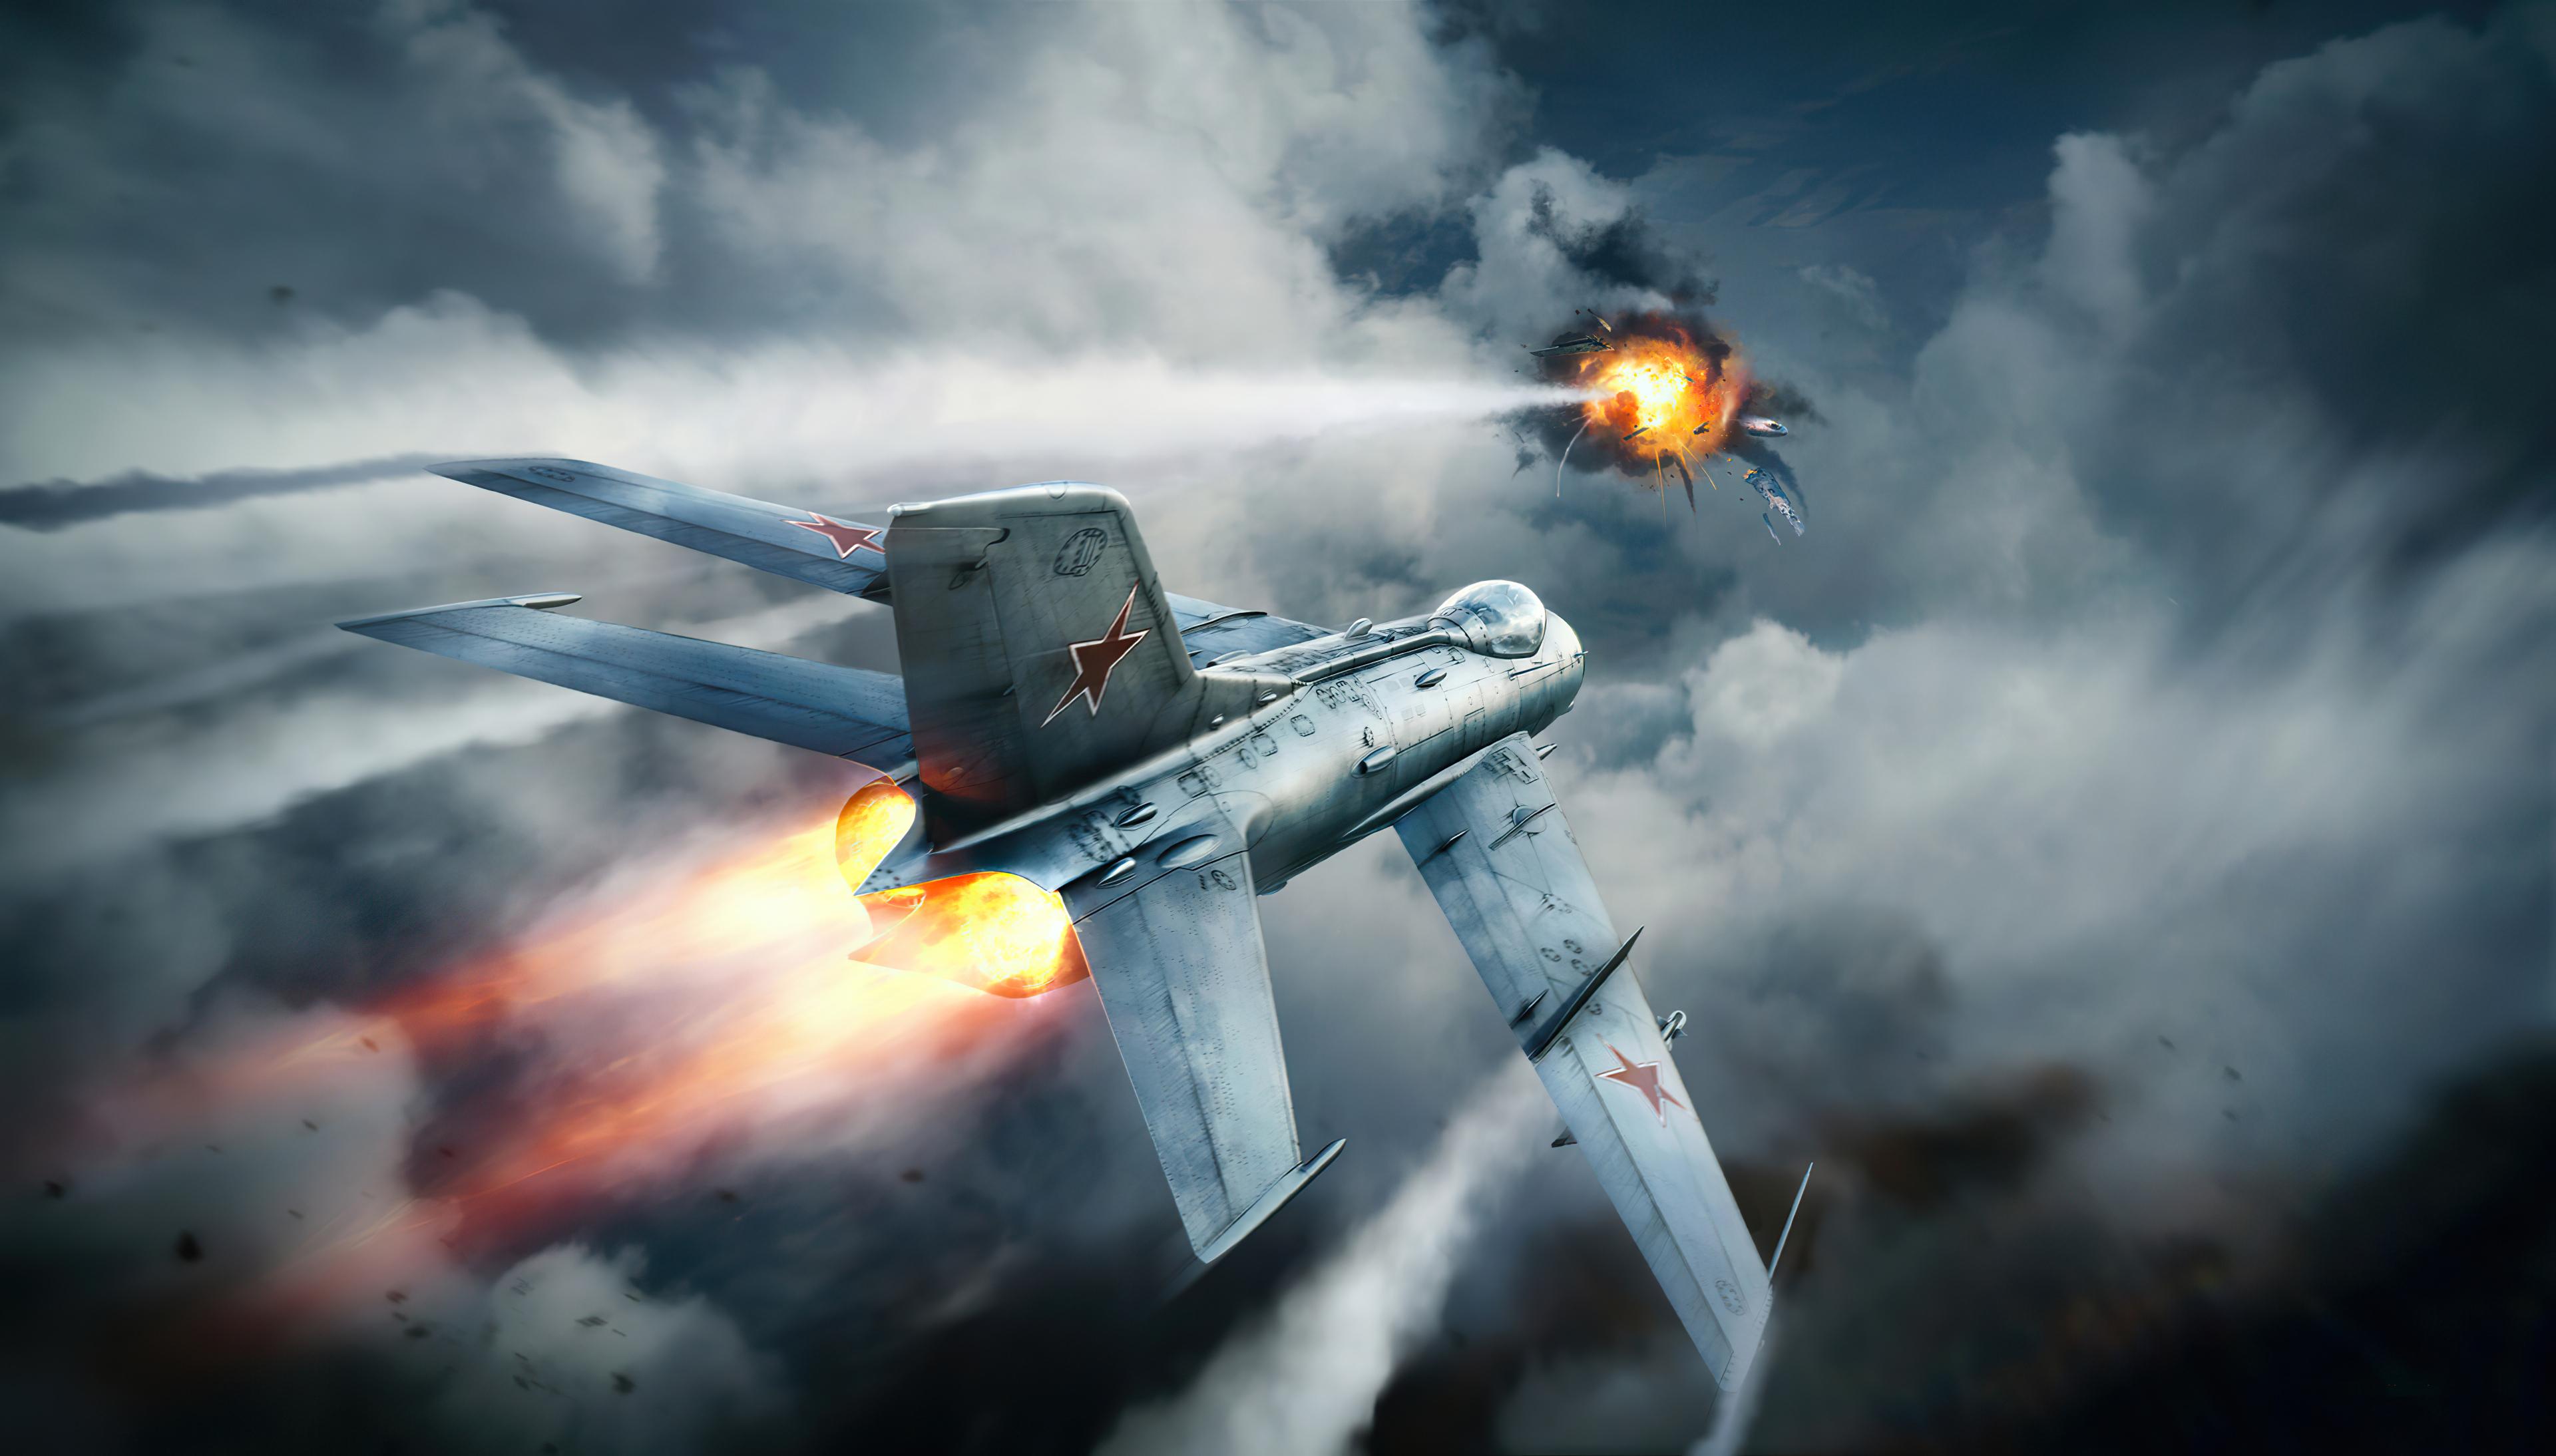 war thunder planes 1589582625 - War Thunder Planes - War Thunder Planes wallpapers, War Thunder Planes 4k wallpapers